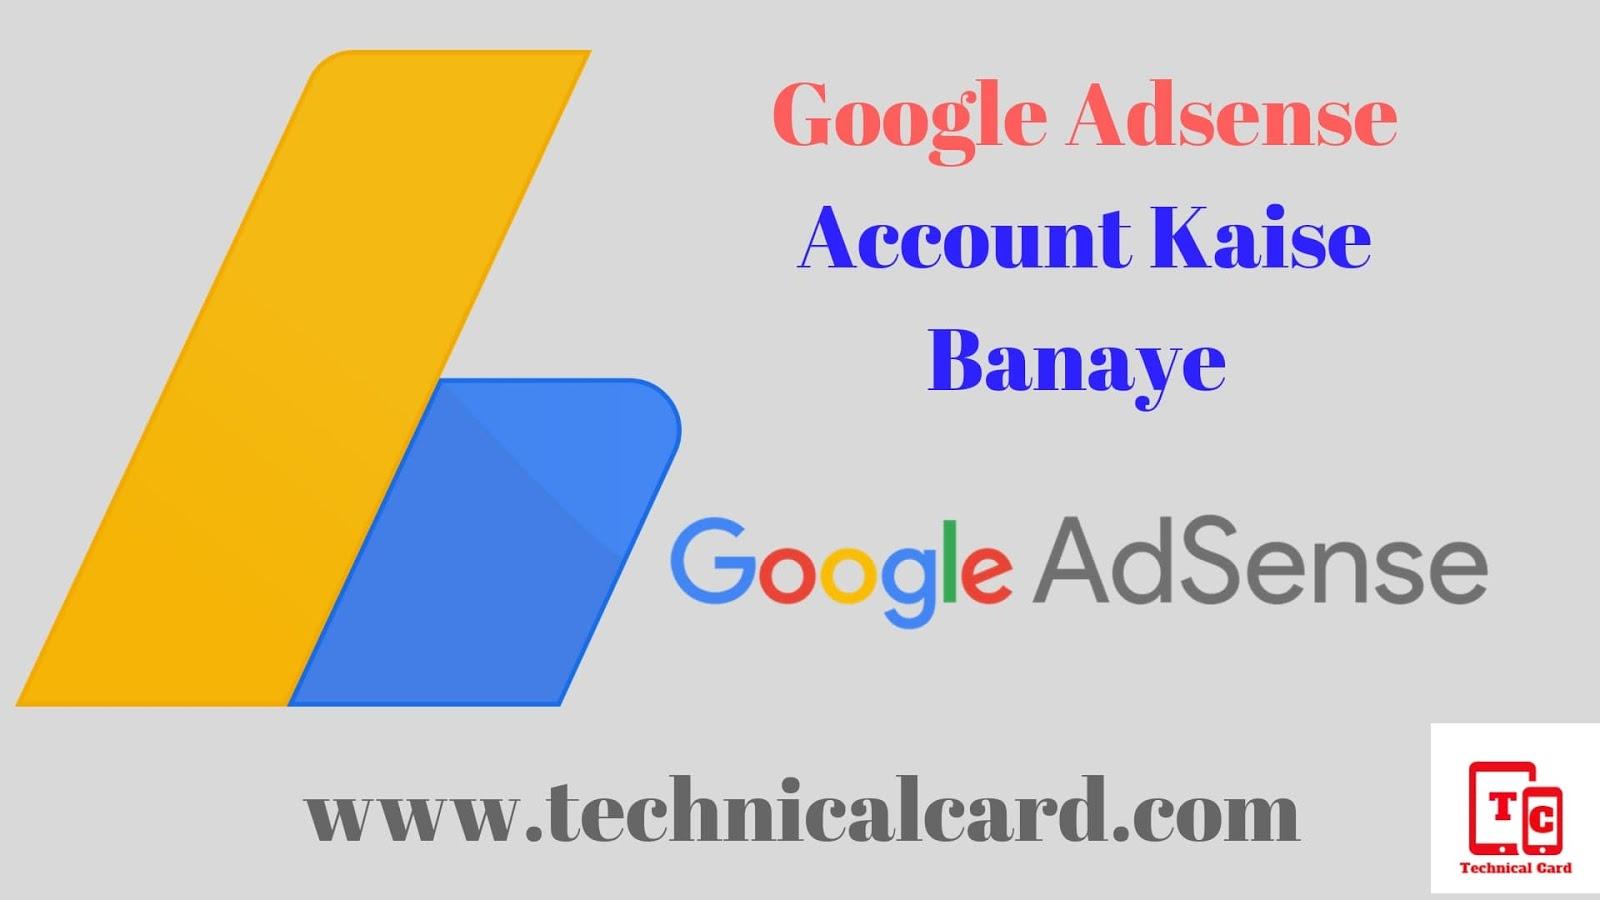 Google Adsense Account Kaise Banaye Full Guide In Hindi